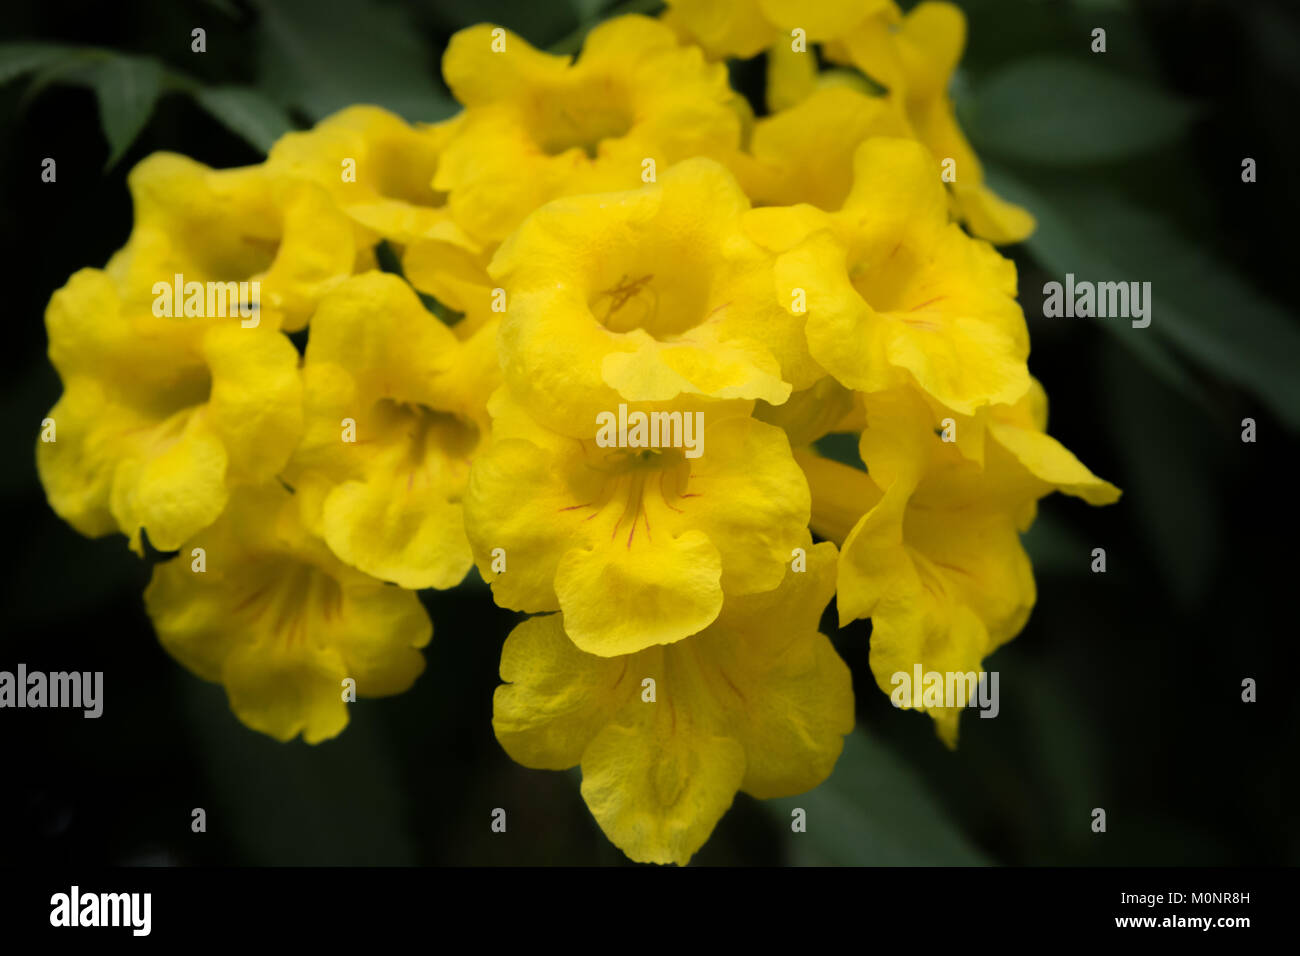 Fiori Gialli Bellissimi.Close Up Di Un Gruppo Di Bellissimi Fiori Gialli Foto Immagine